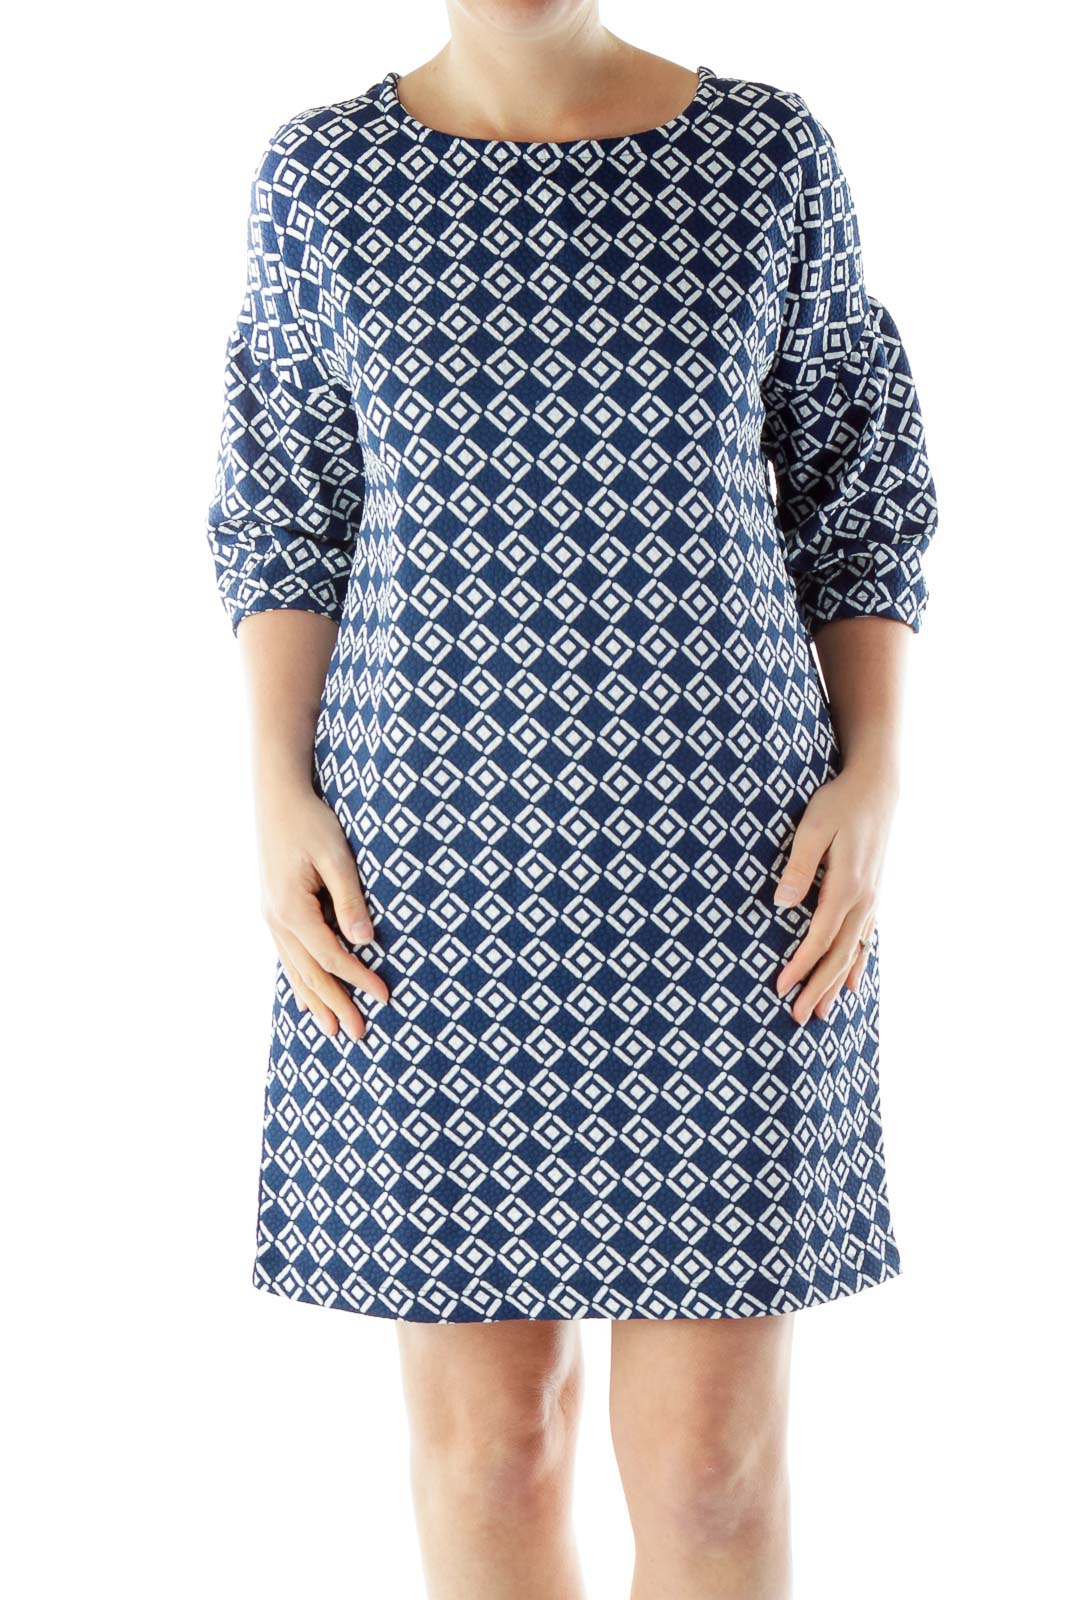 Blue White Geometric Print Day Dress Front